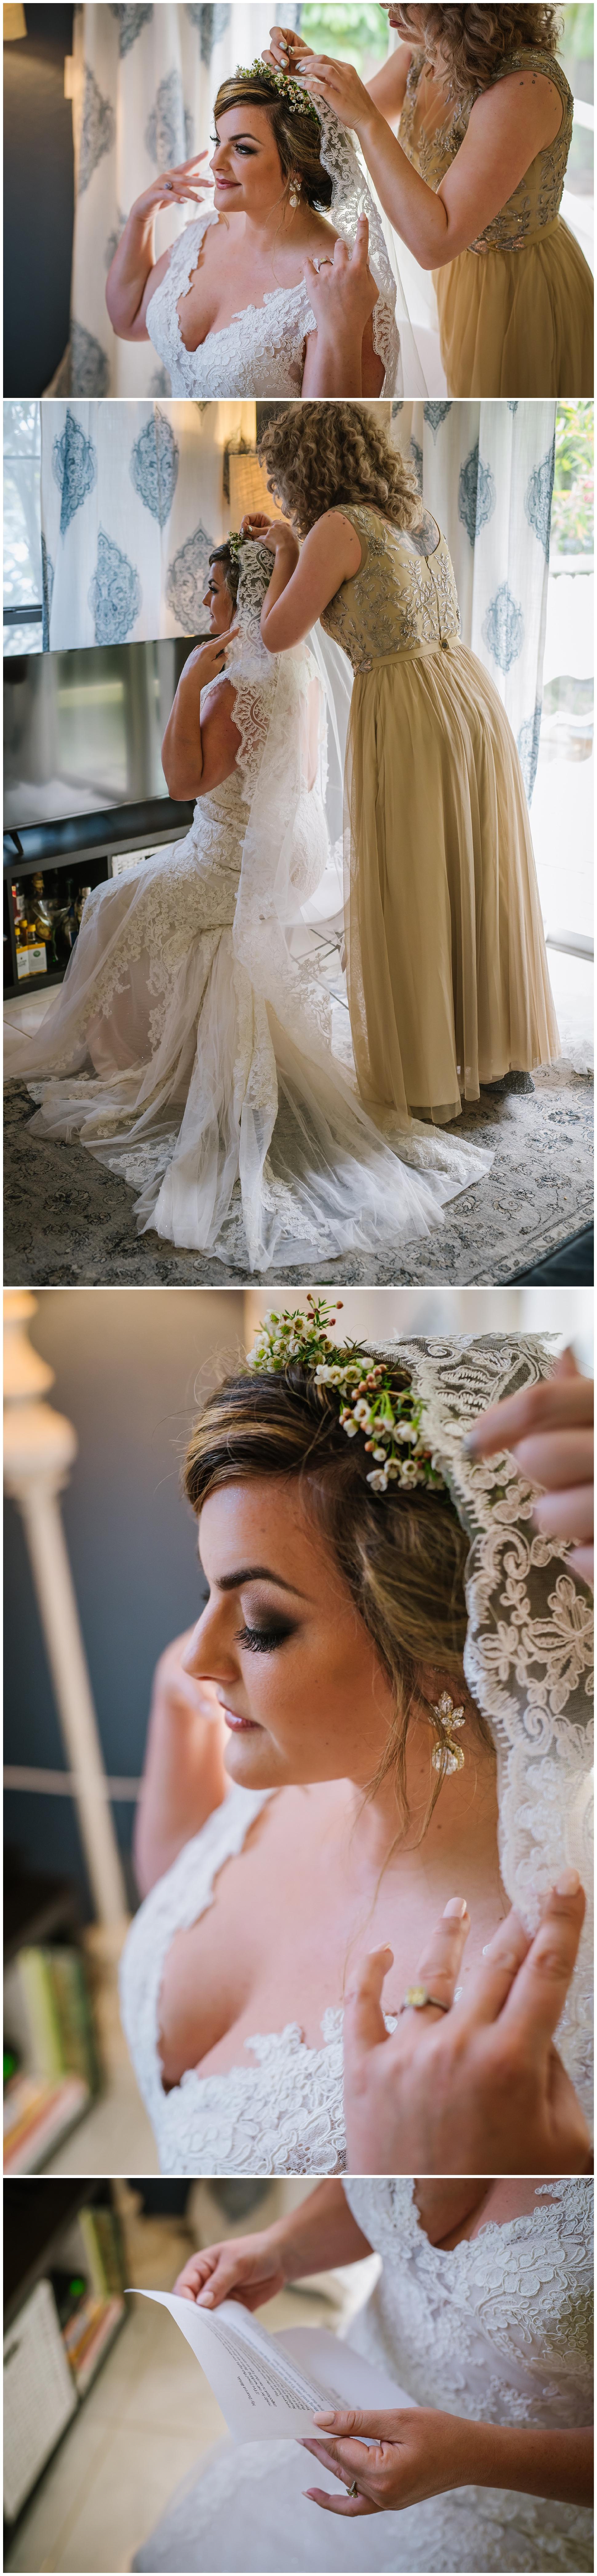 st-pete-wedding-photographer-italian-romance-theme-rustic-flower-crown_0382.jpg